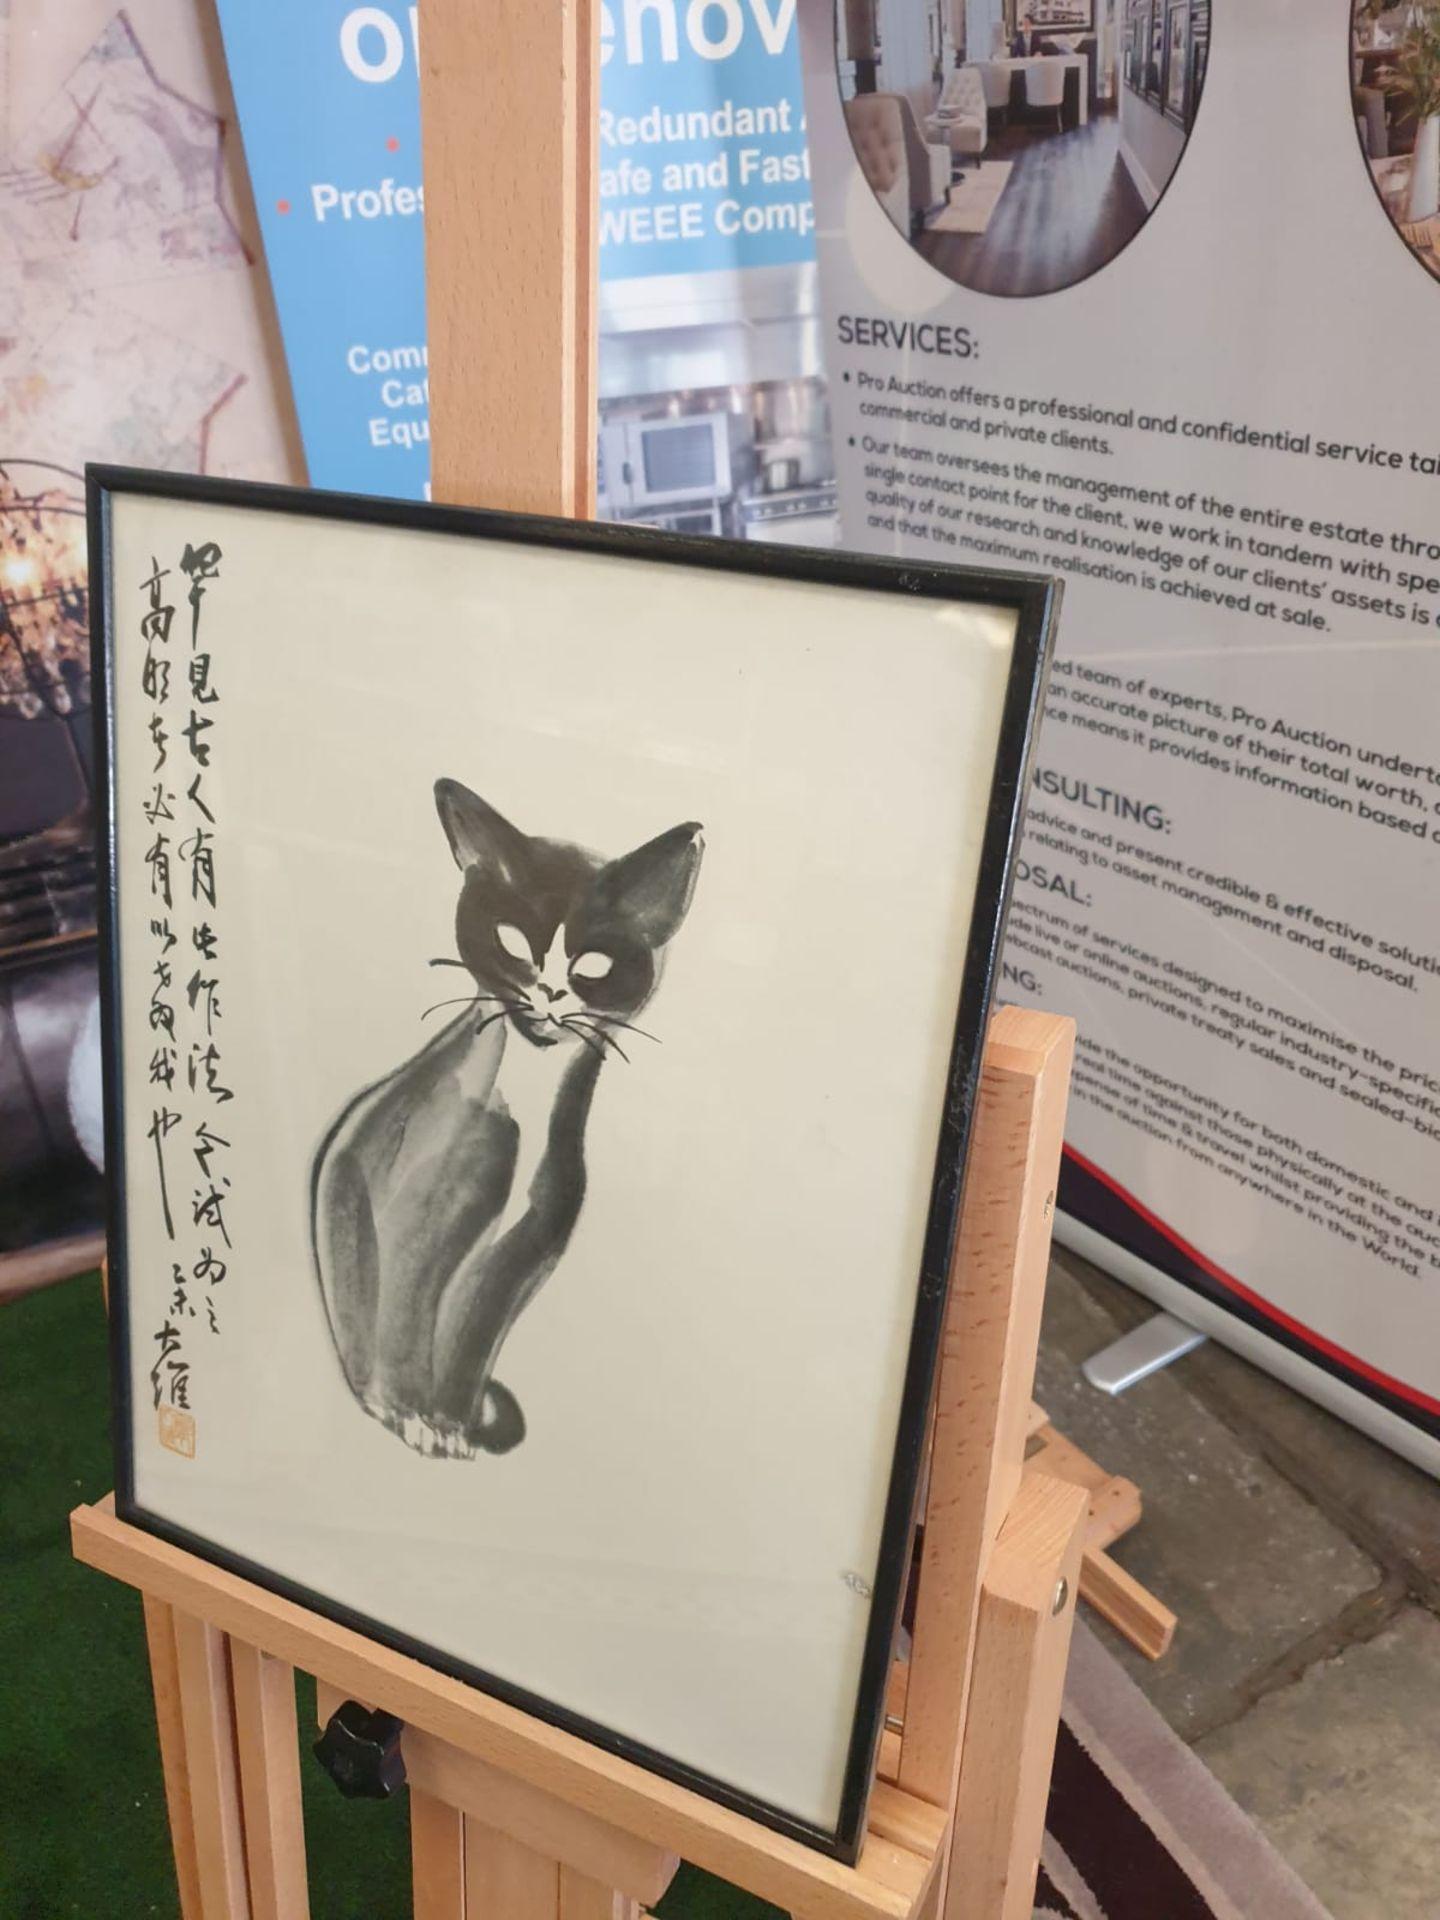 David Kwo Da-Wei (1919-2003) Chinese Lithographic Print Black Cat - Kim Da Wei Kwo, David Kwo 1919- - Image 2 of 3